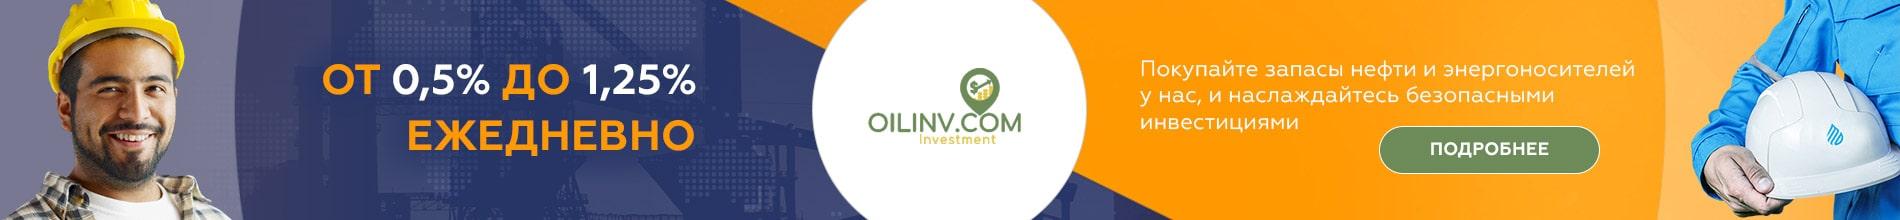 Баннер в шапке oilinv